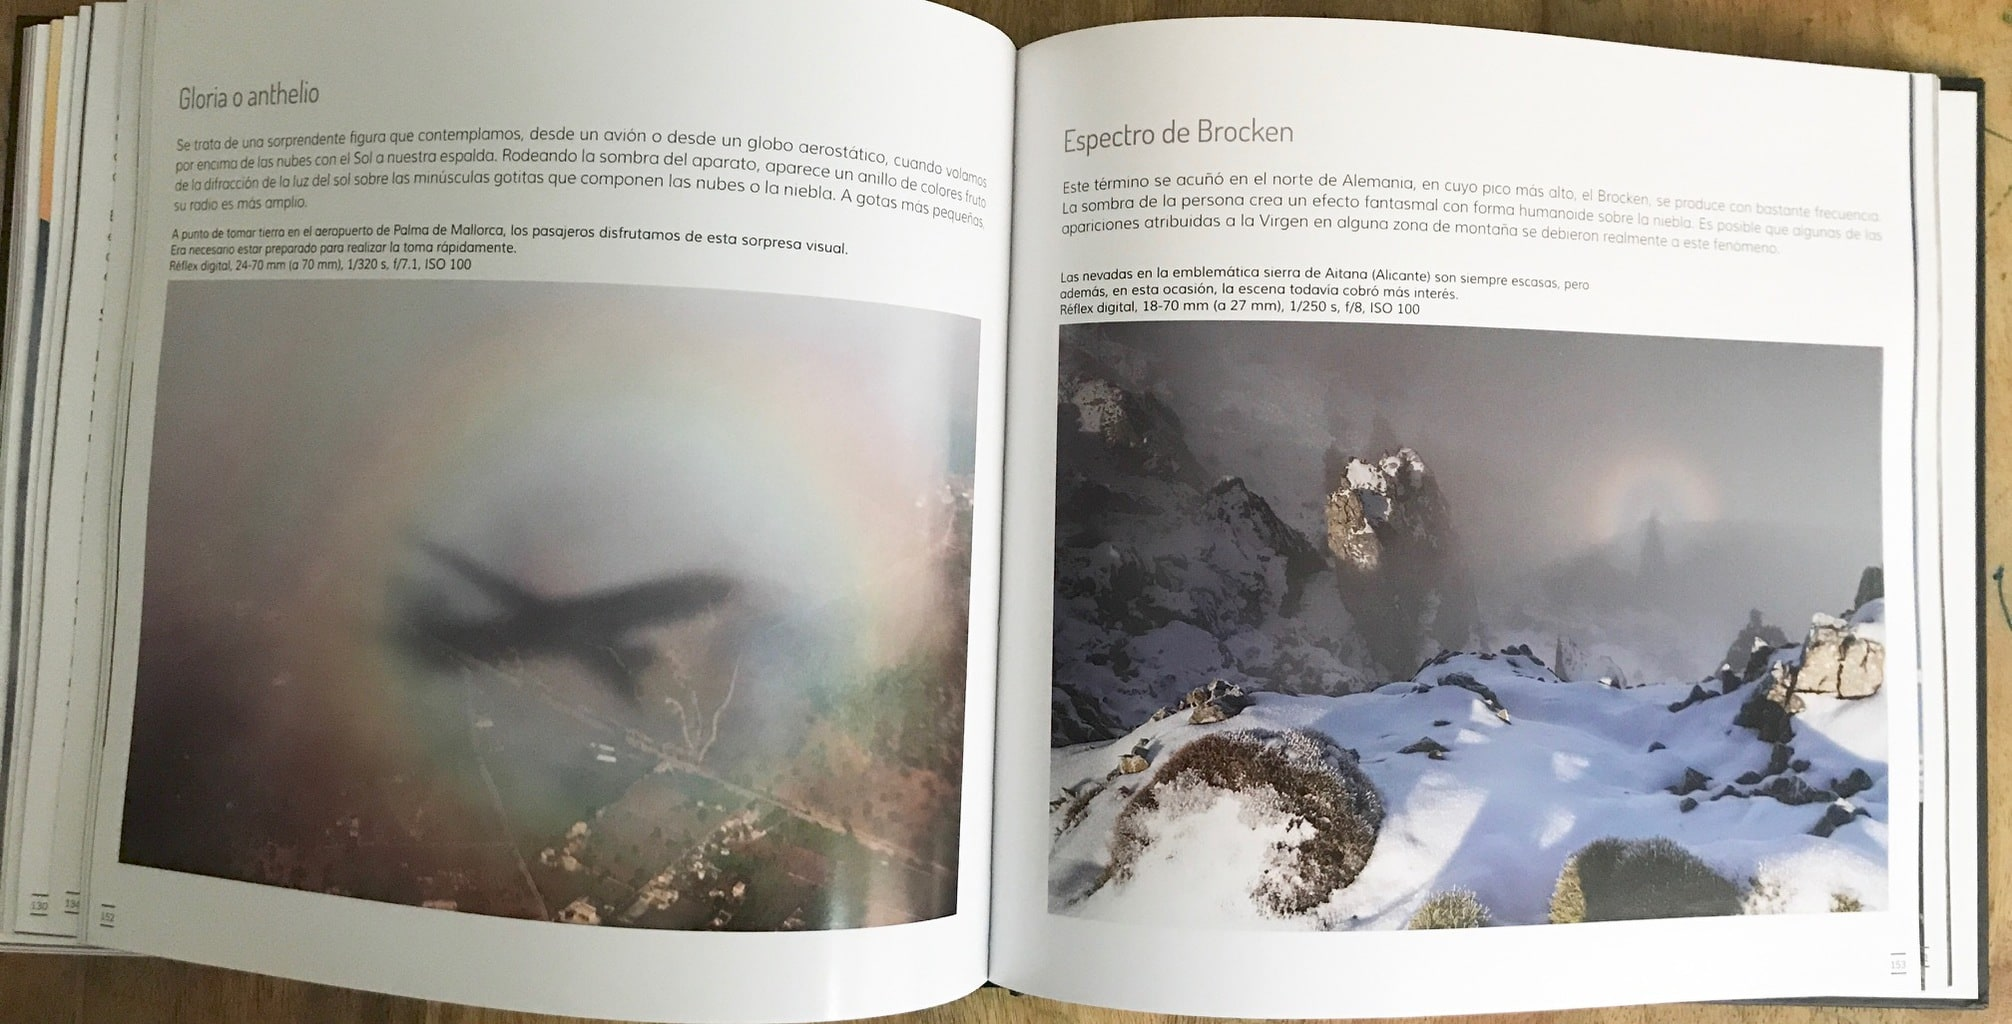 Espectro Libro Fotografiar Con Mal Tiempo